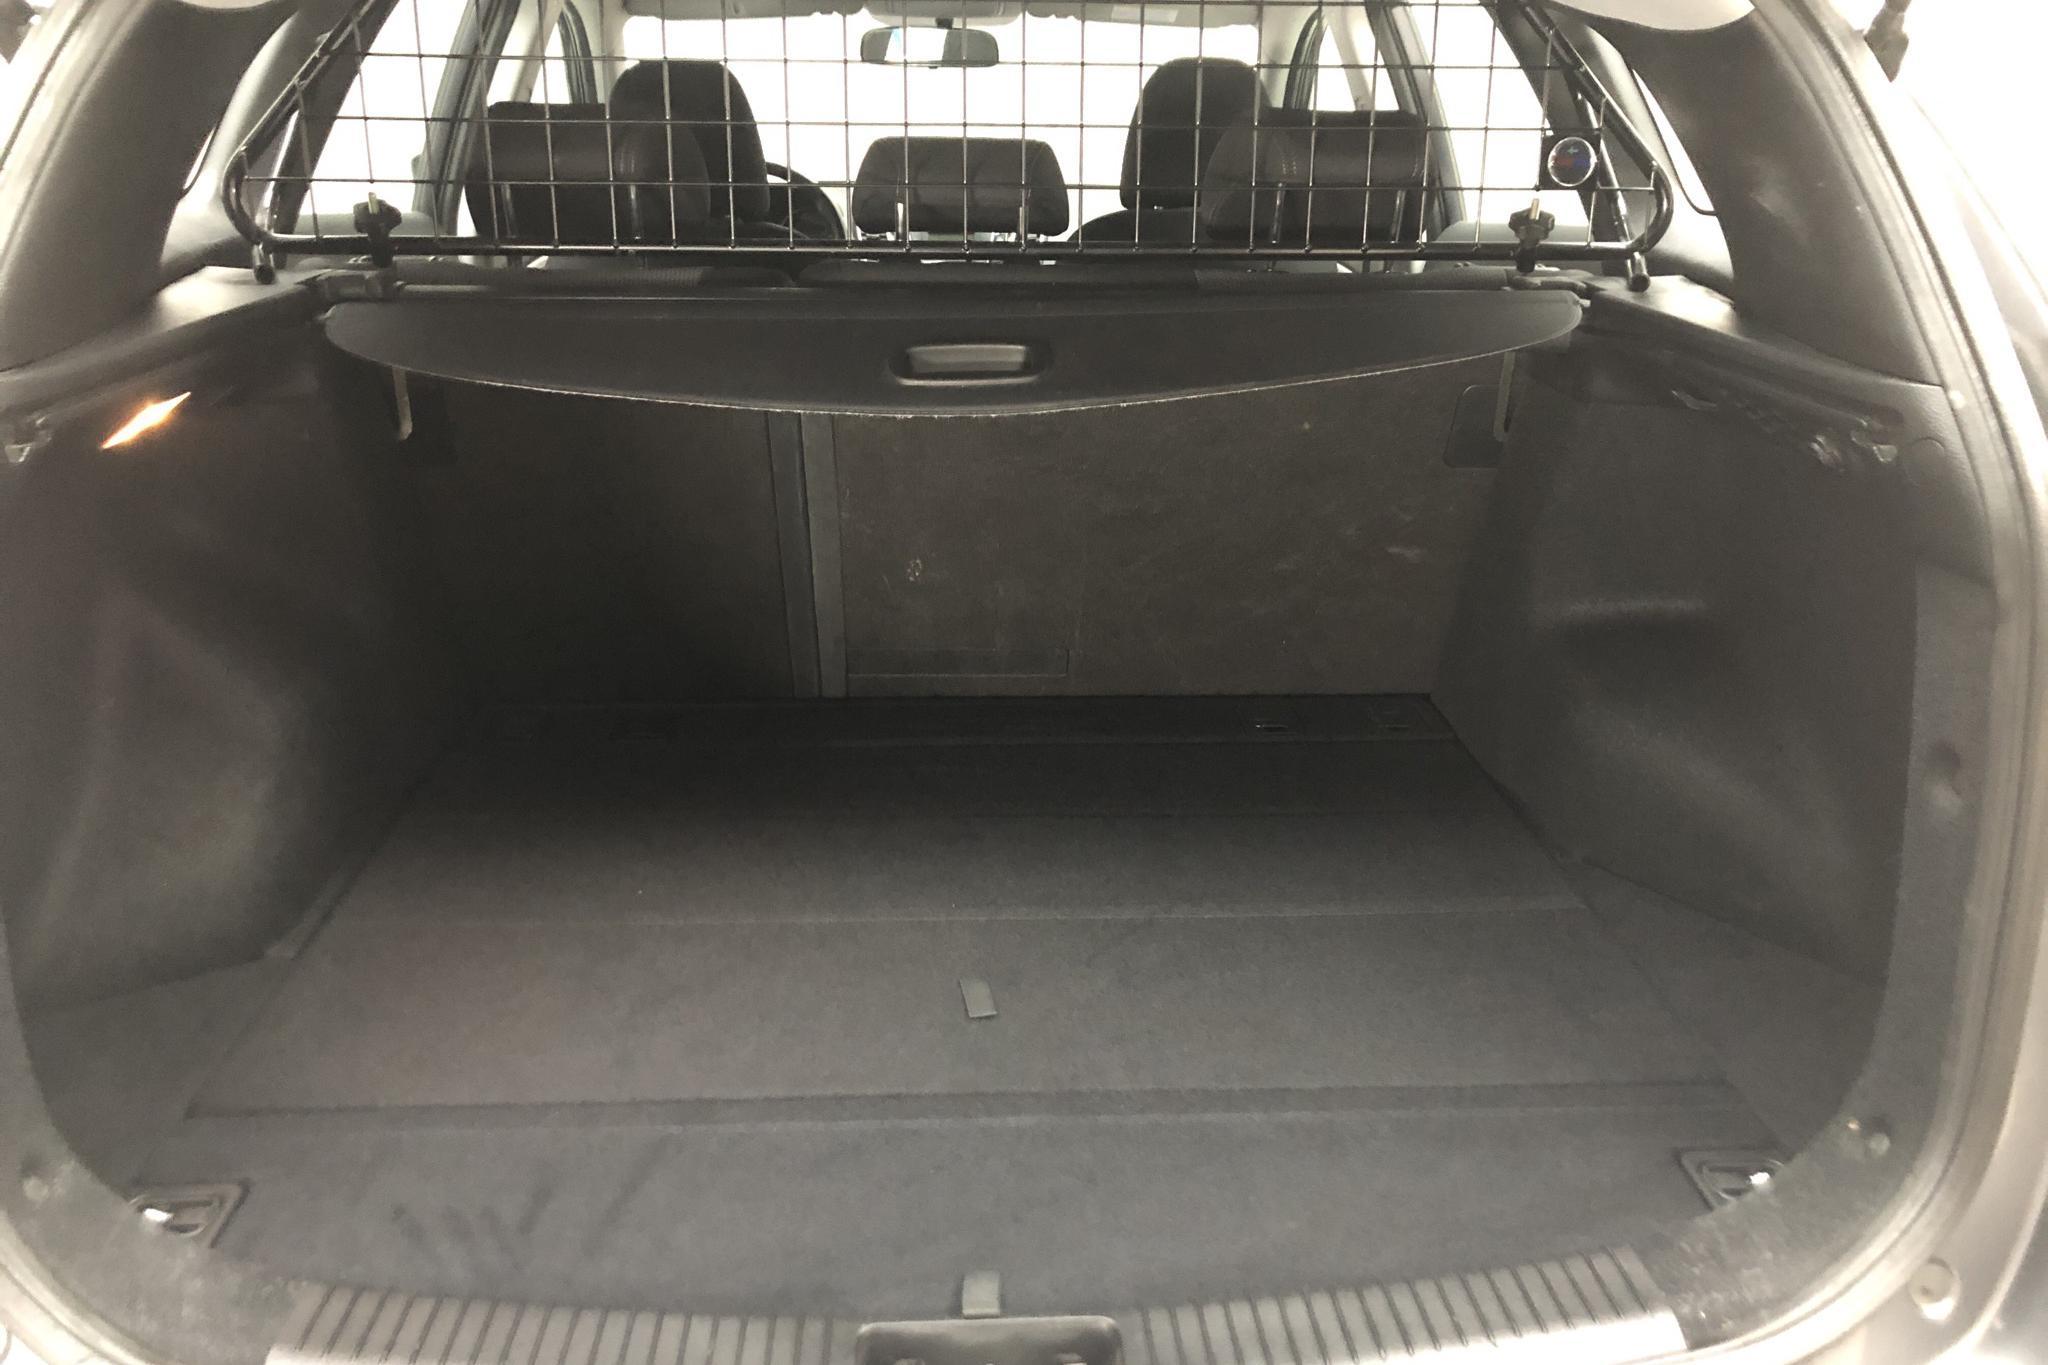 Hyundai i30 1.6 CRDi Kombi (110hk) - 104 980 km - Manual - gray - 2014